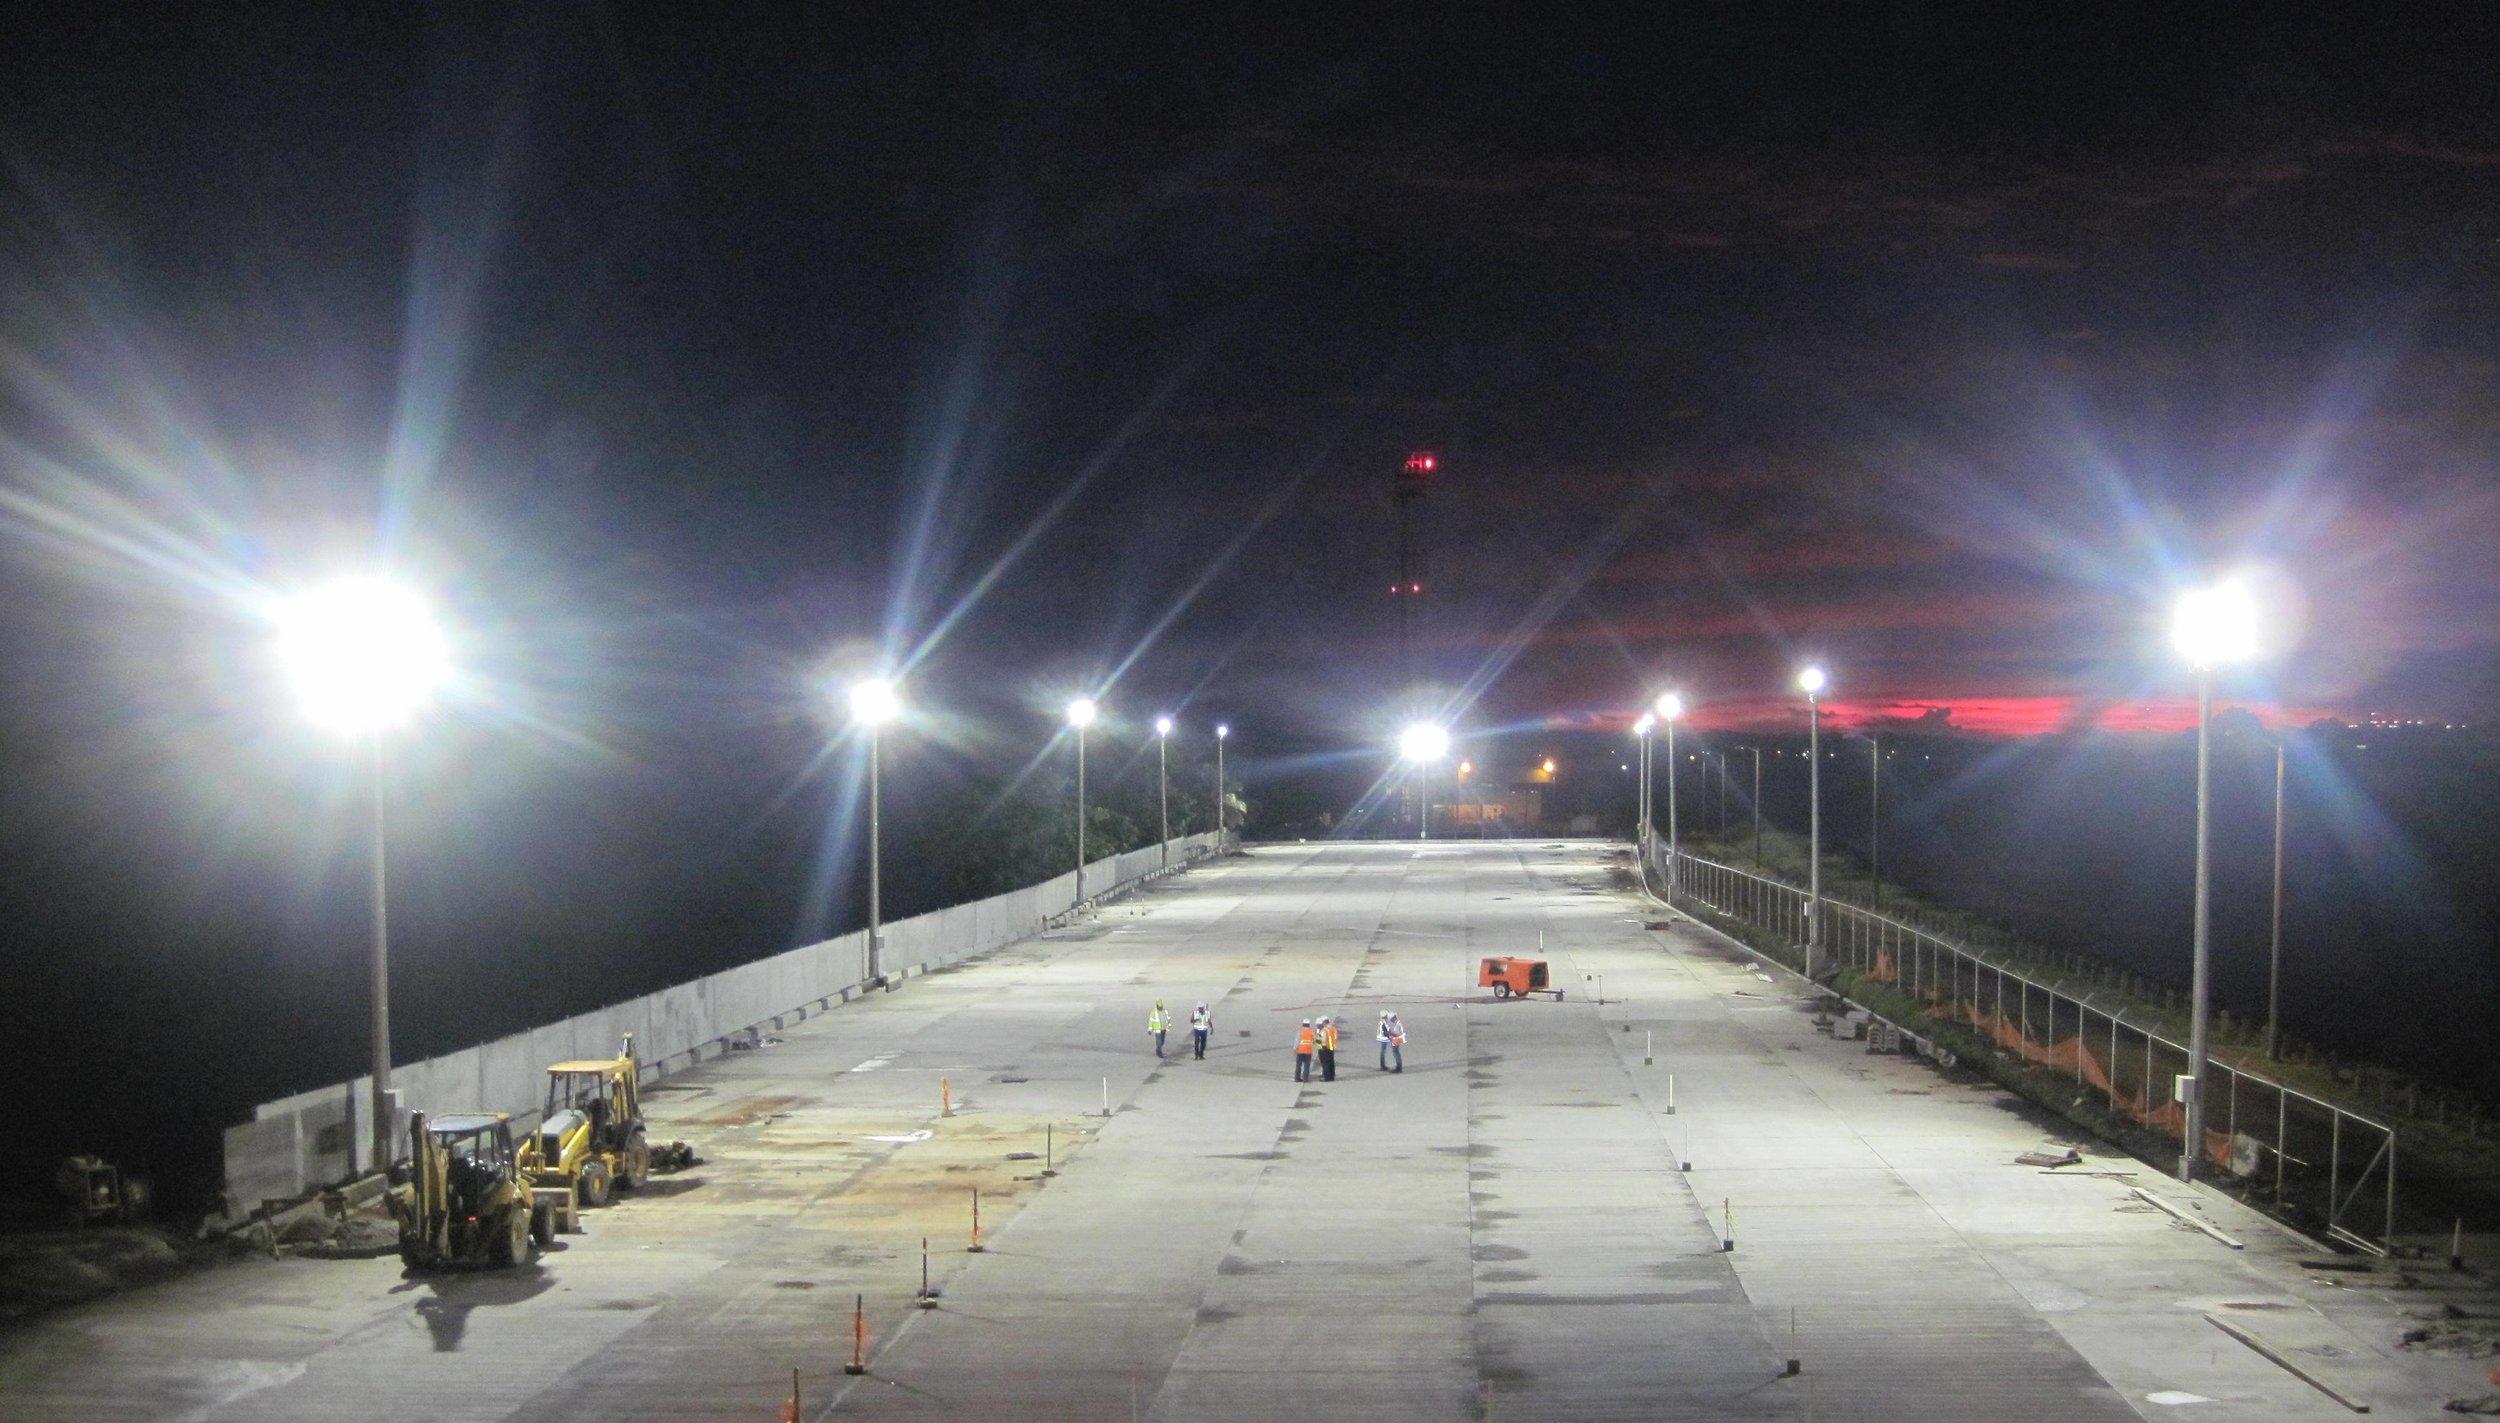 SONARAY™ LED Lighting Teams up with Dingo S.A. to Provide Exceptional Lighting for Port & News u2014 SONARAY | Commercial u0026 Industrial LED Lighting azcodes.com